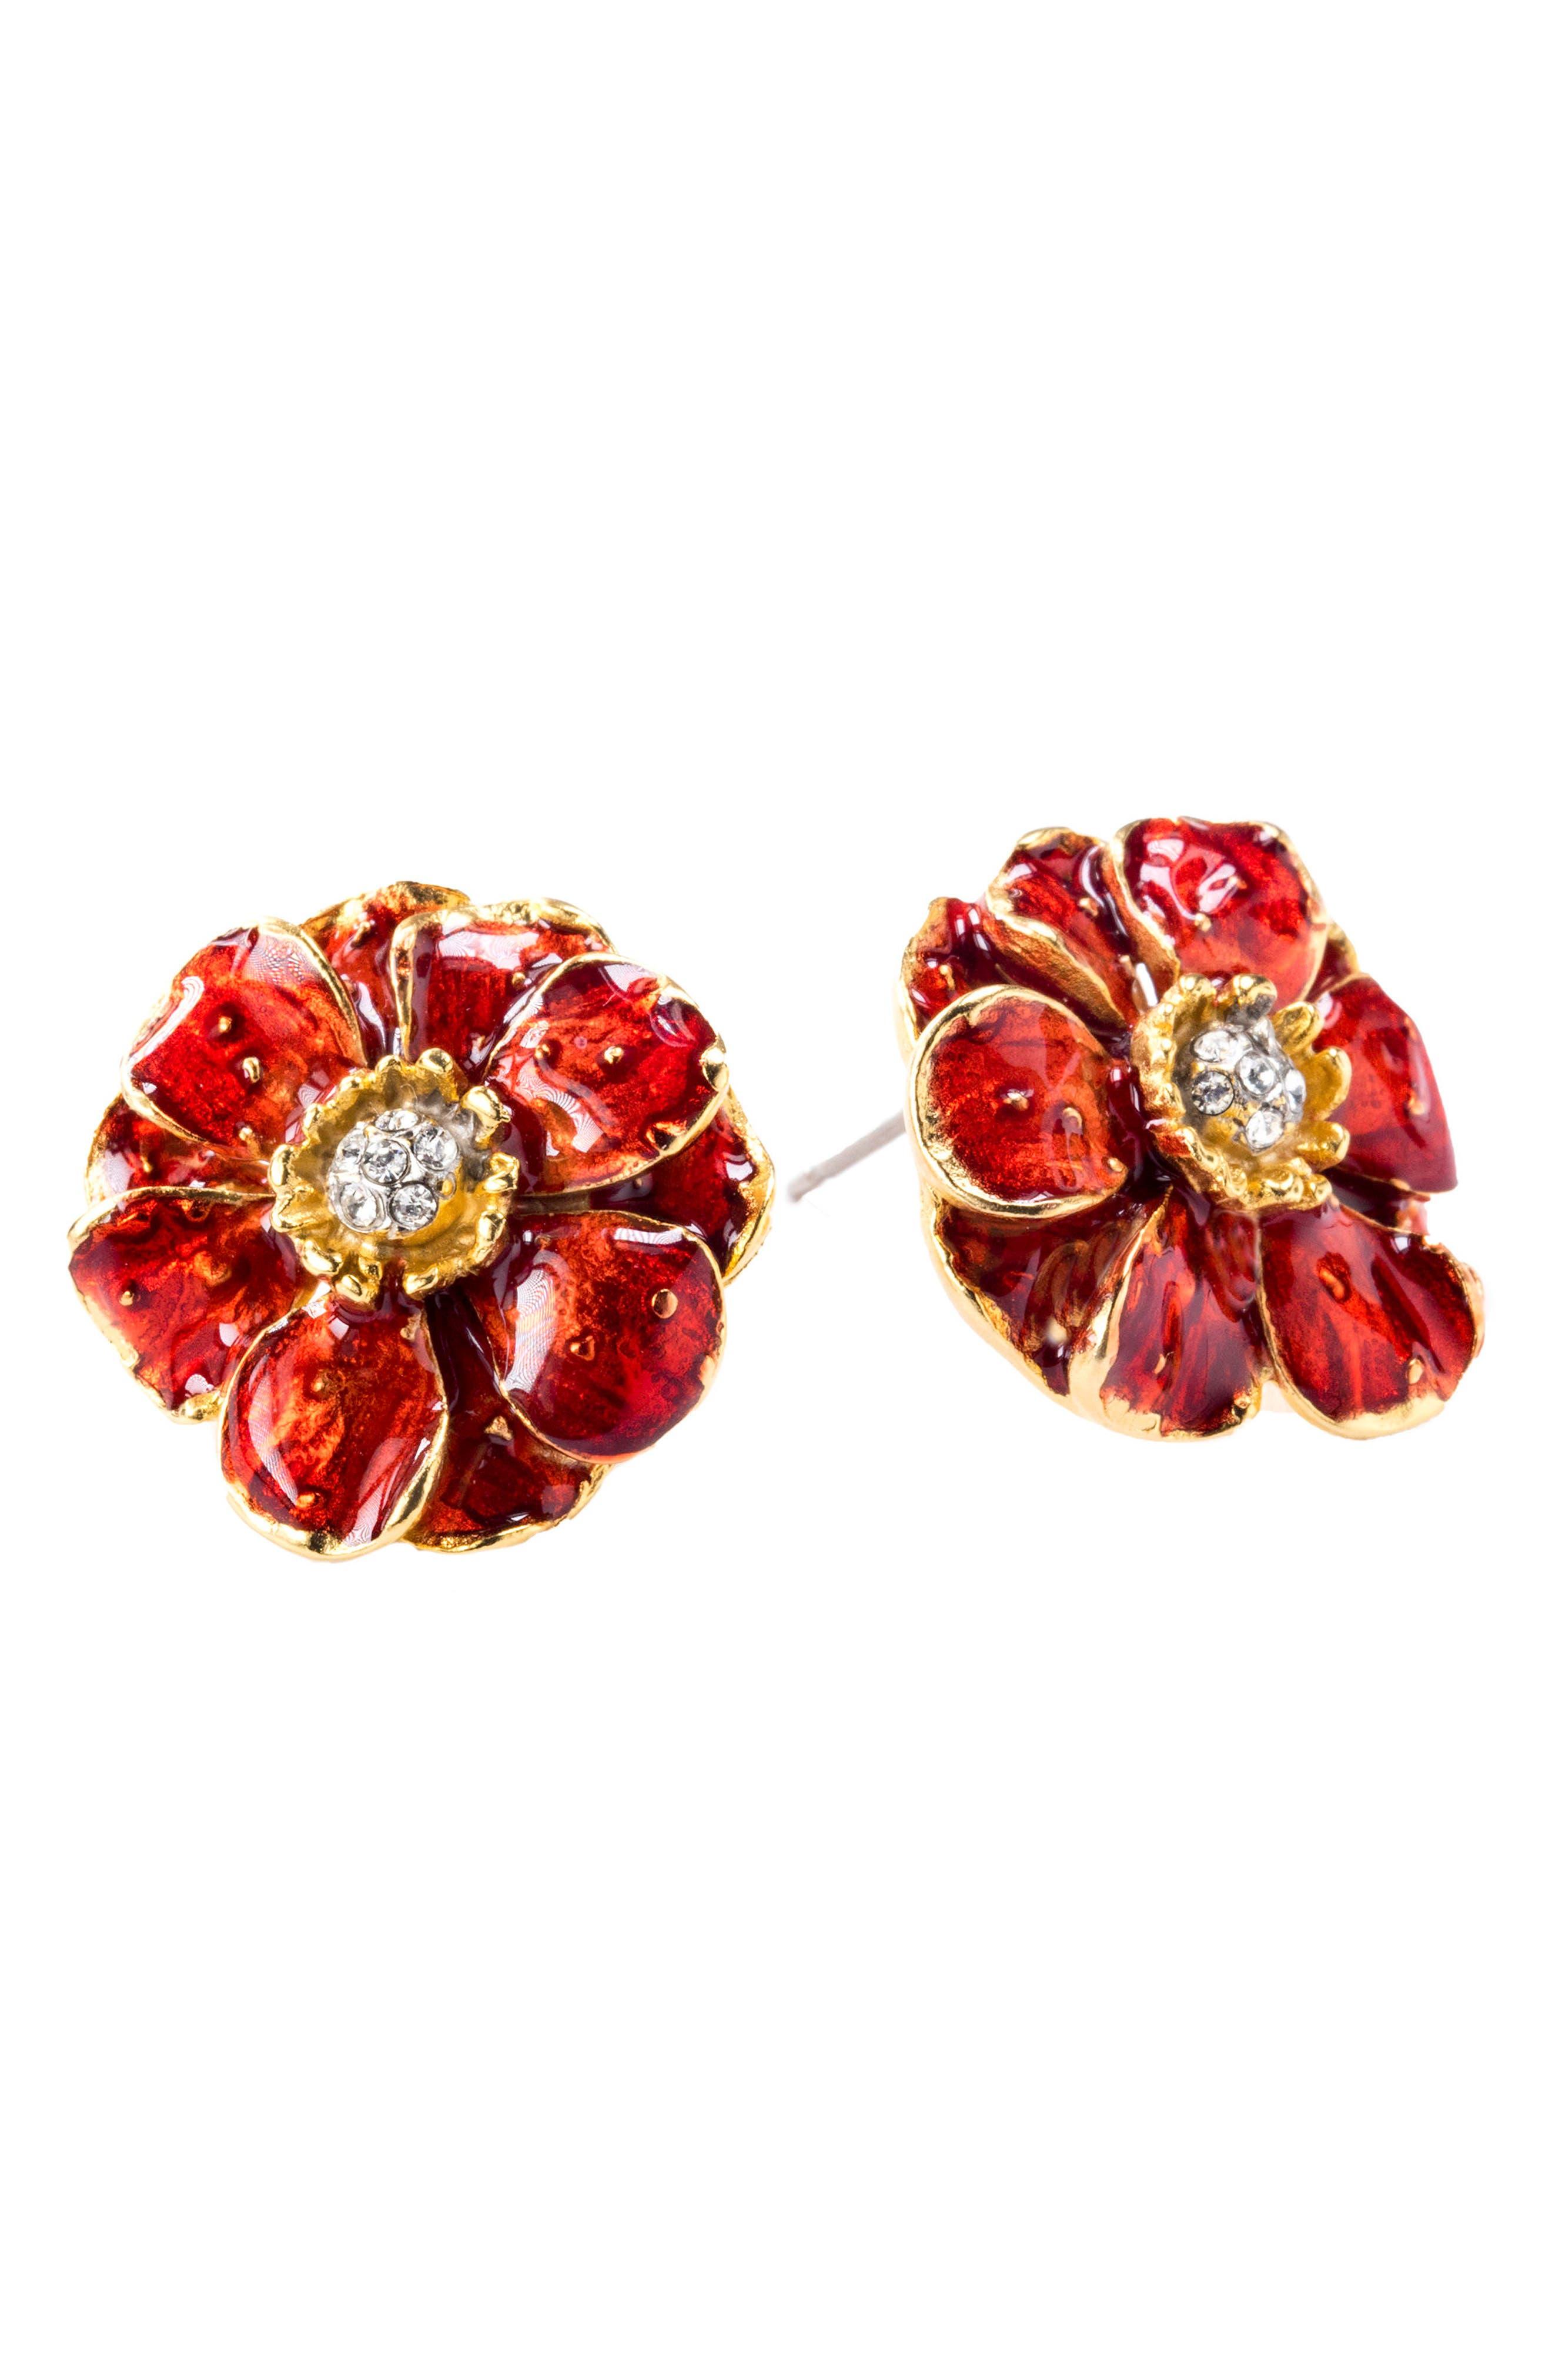 Goldtone Les Roses Earrings,                             Alternate thumbnail 3, color,                             Multi